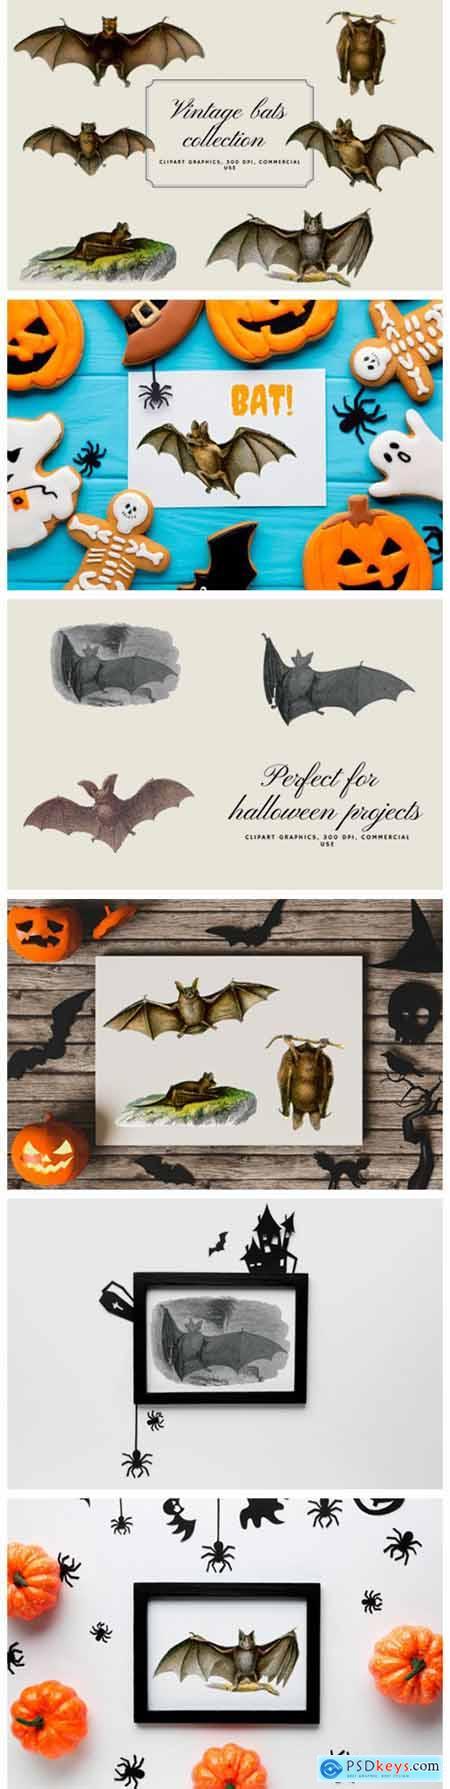 Vintage Bats Collection, Creepy Graphics 5919304